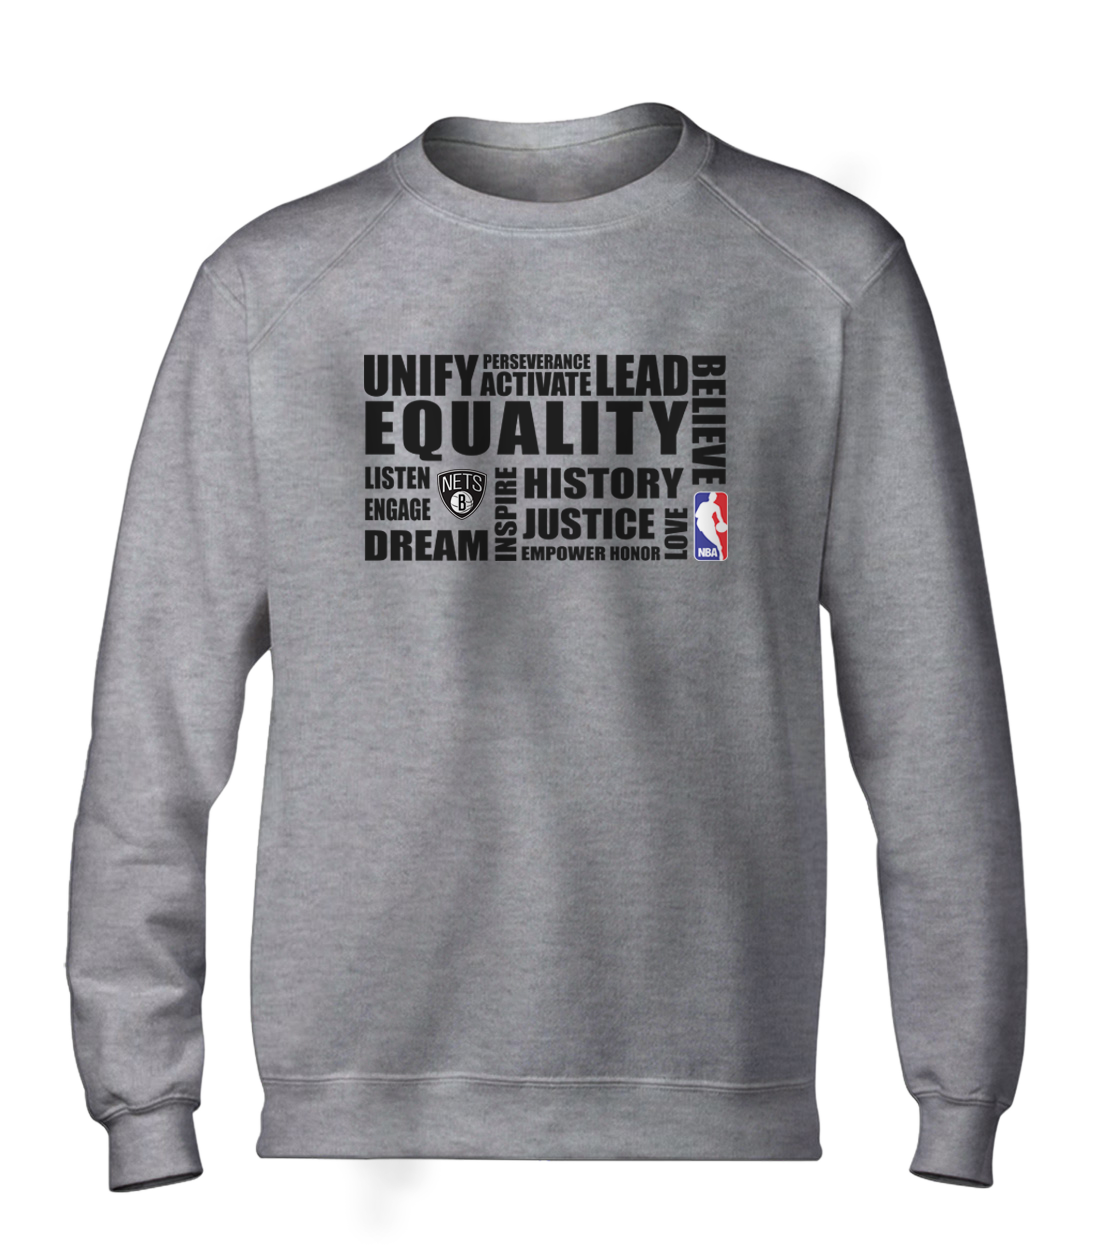 EQUALITY Brooklyn Nets Basic (BSC-GRY-NP-292-NBA.BRKL.syh)